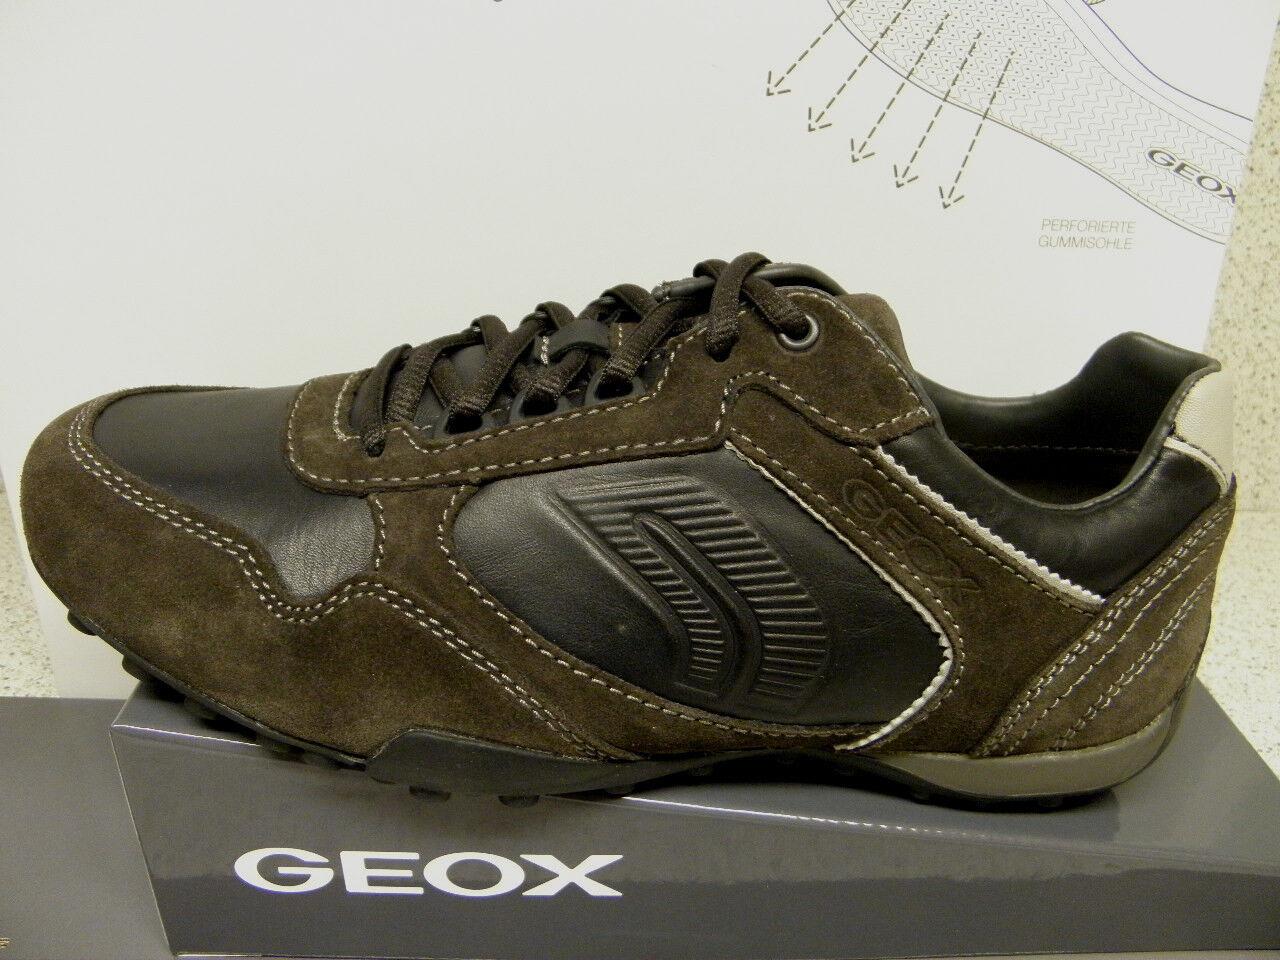 GEOX® bisher 119,95   Sneaker schwarz-braun + gratis Premium - Socken (G27)